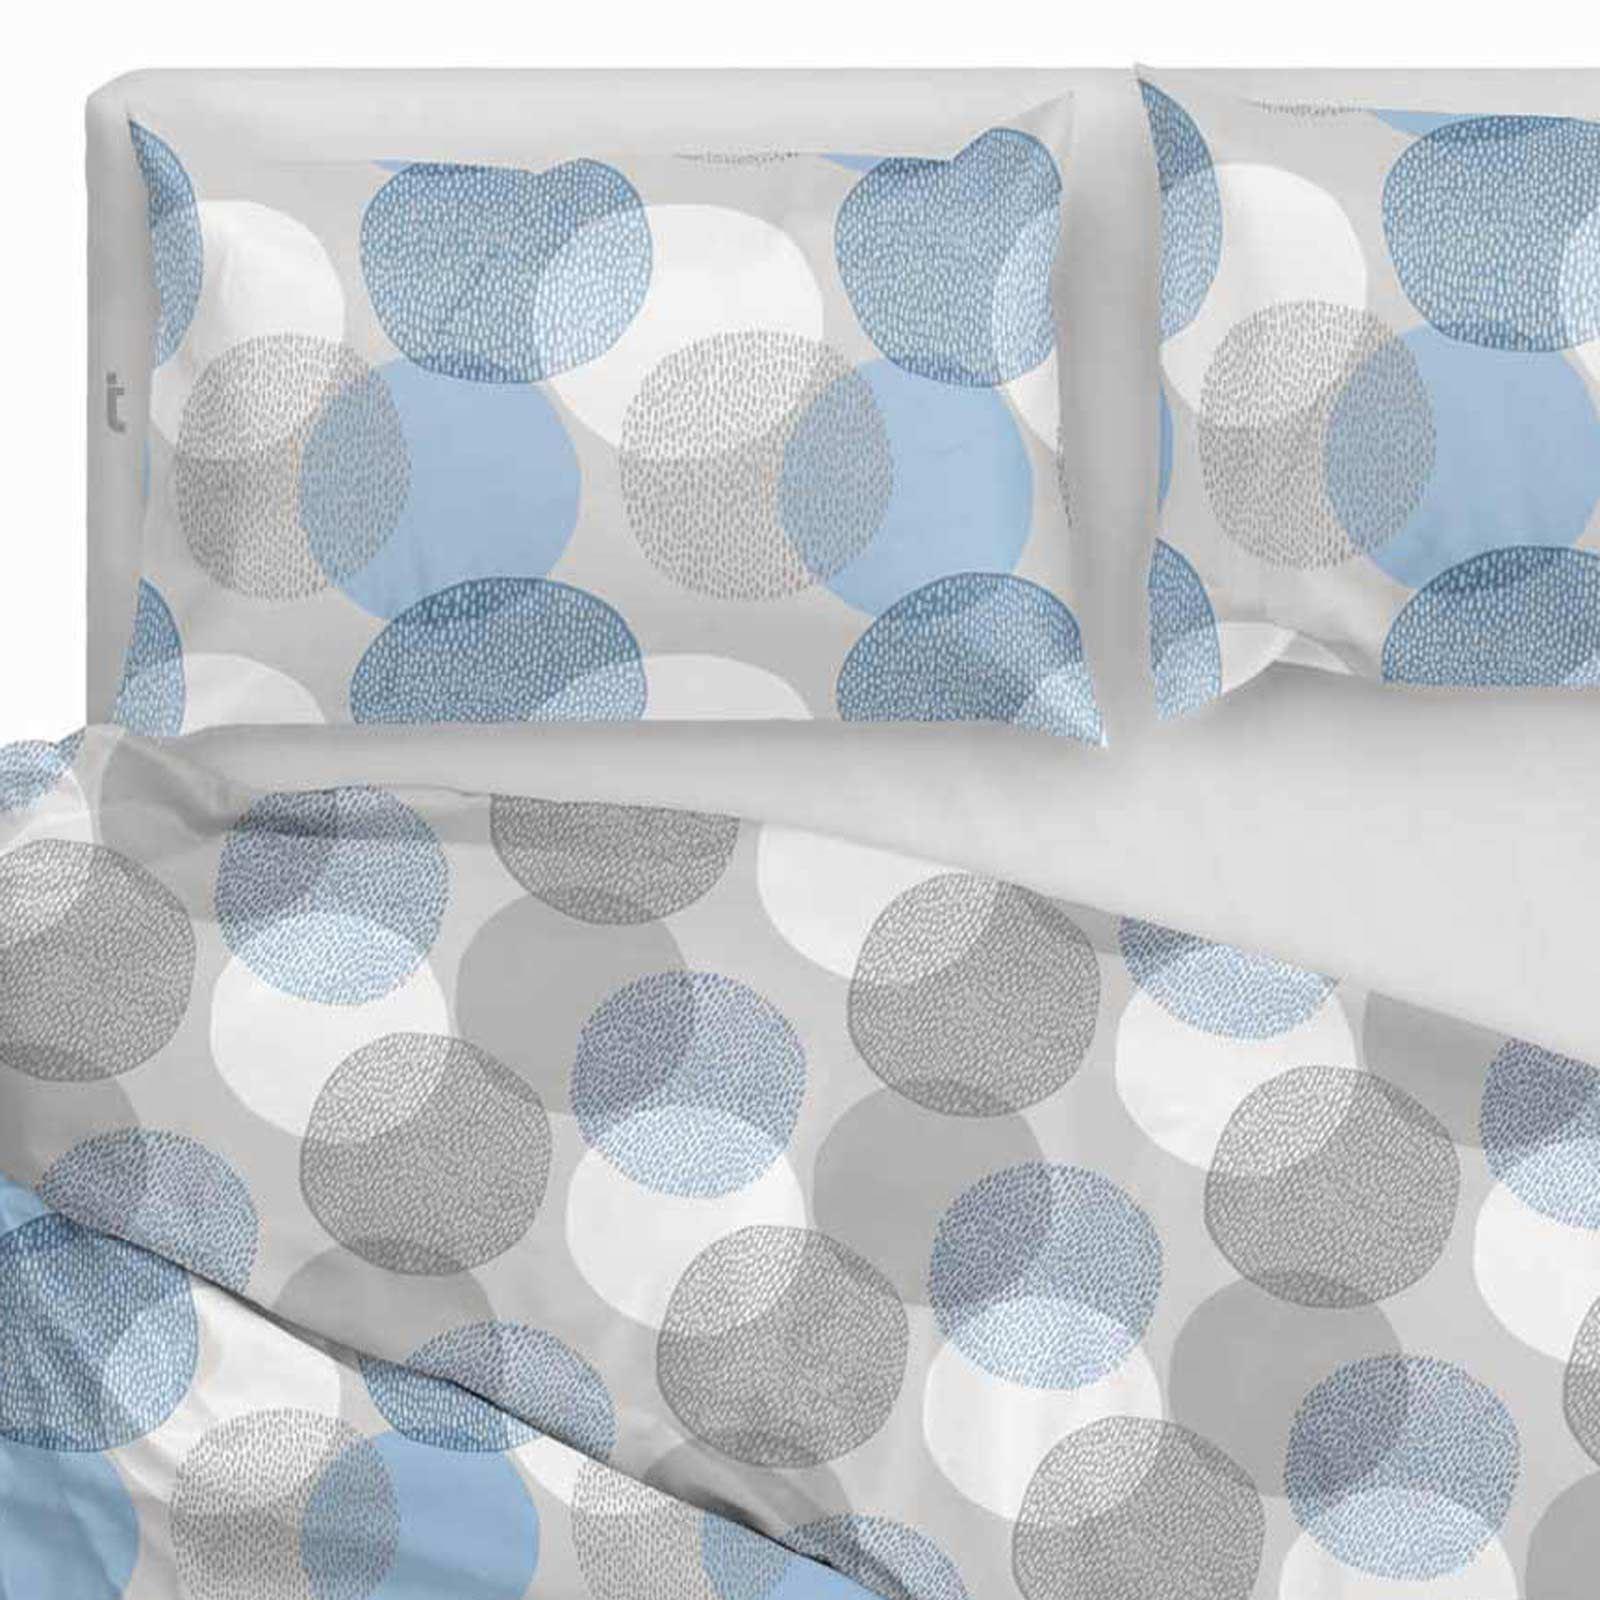 Funda-nordica-azul-azul-marino-verde-azulado-edredon-algodon-estampado-juego-conjuntos-de-cama-cubre miniatura 4